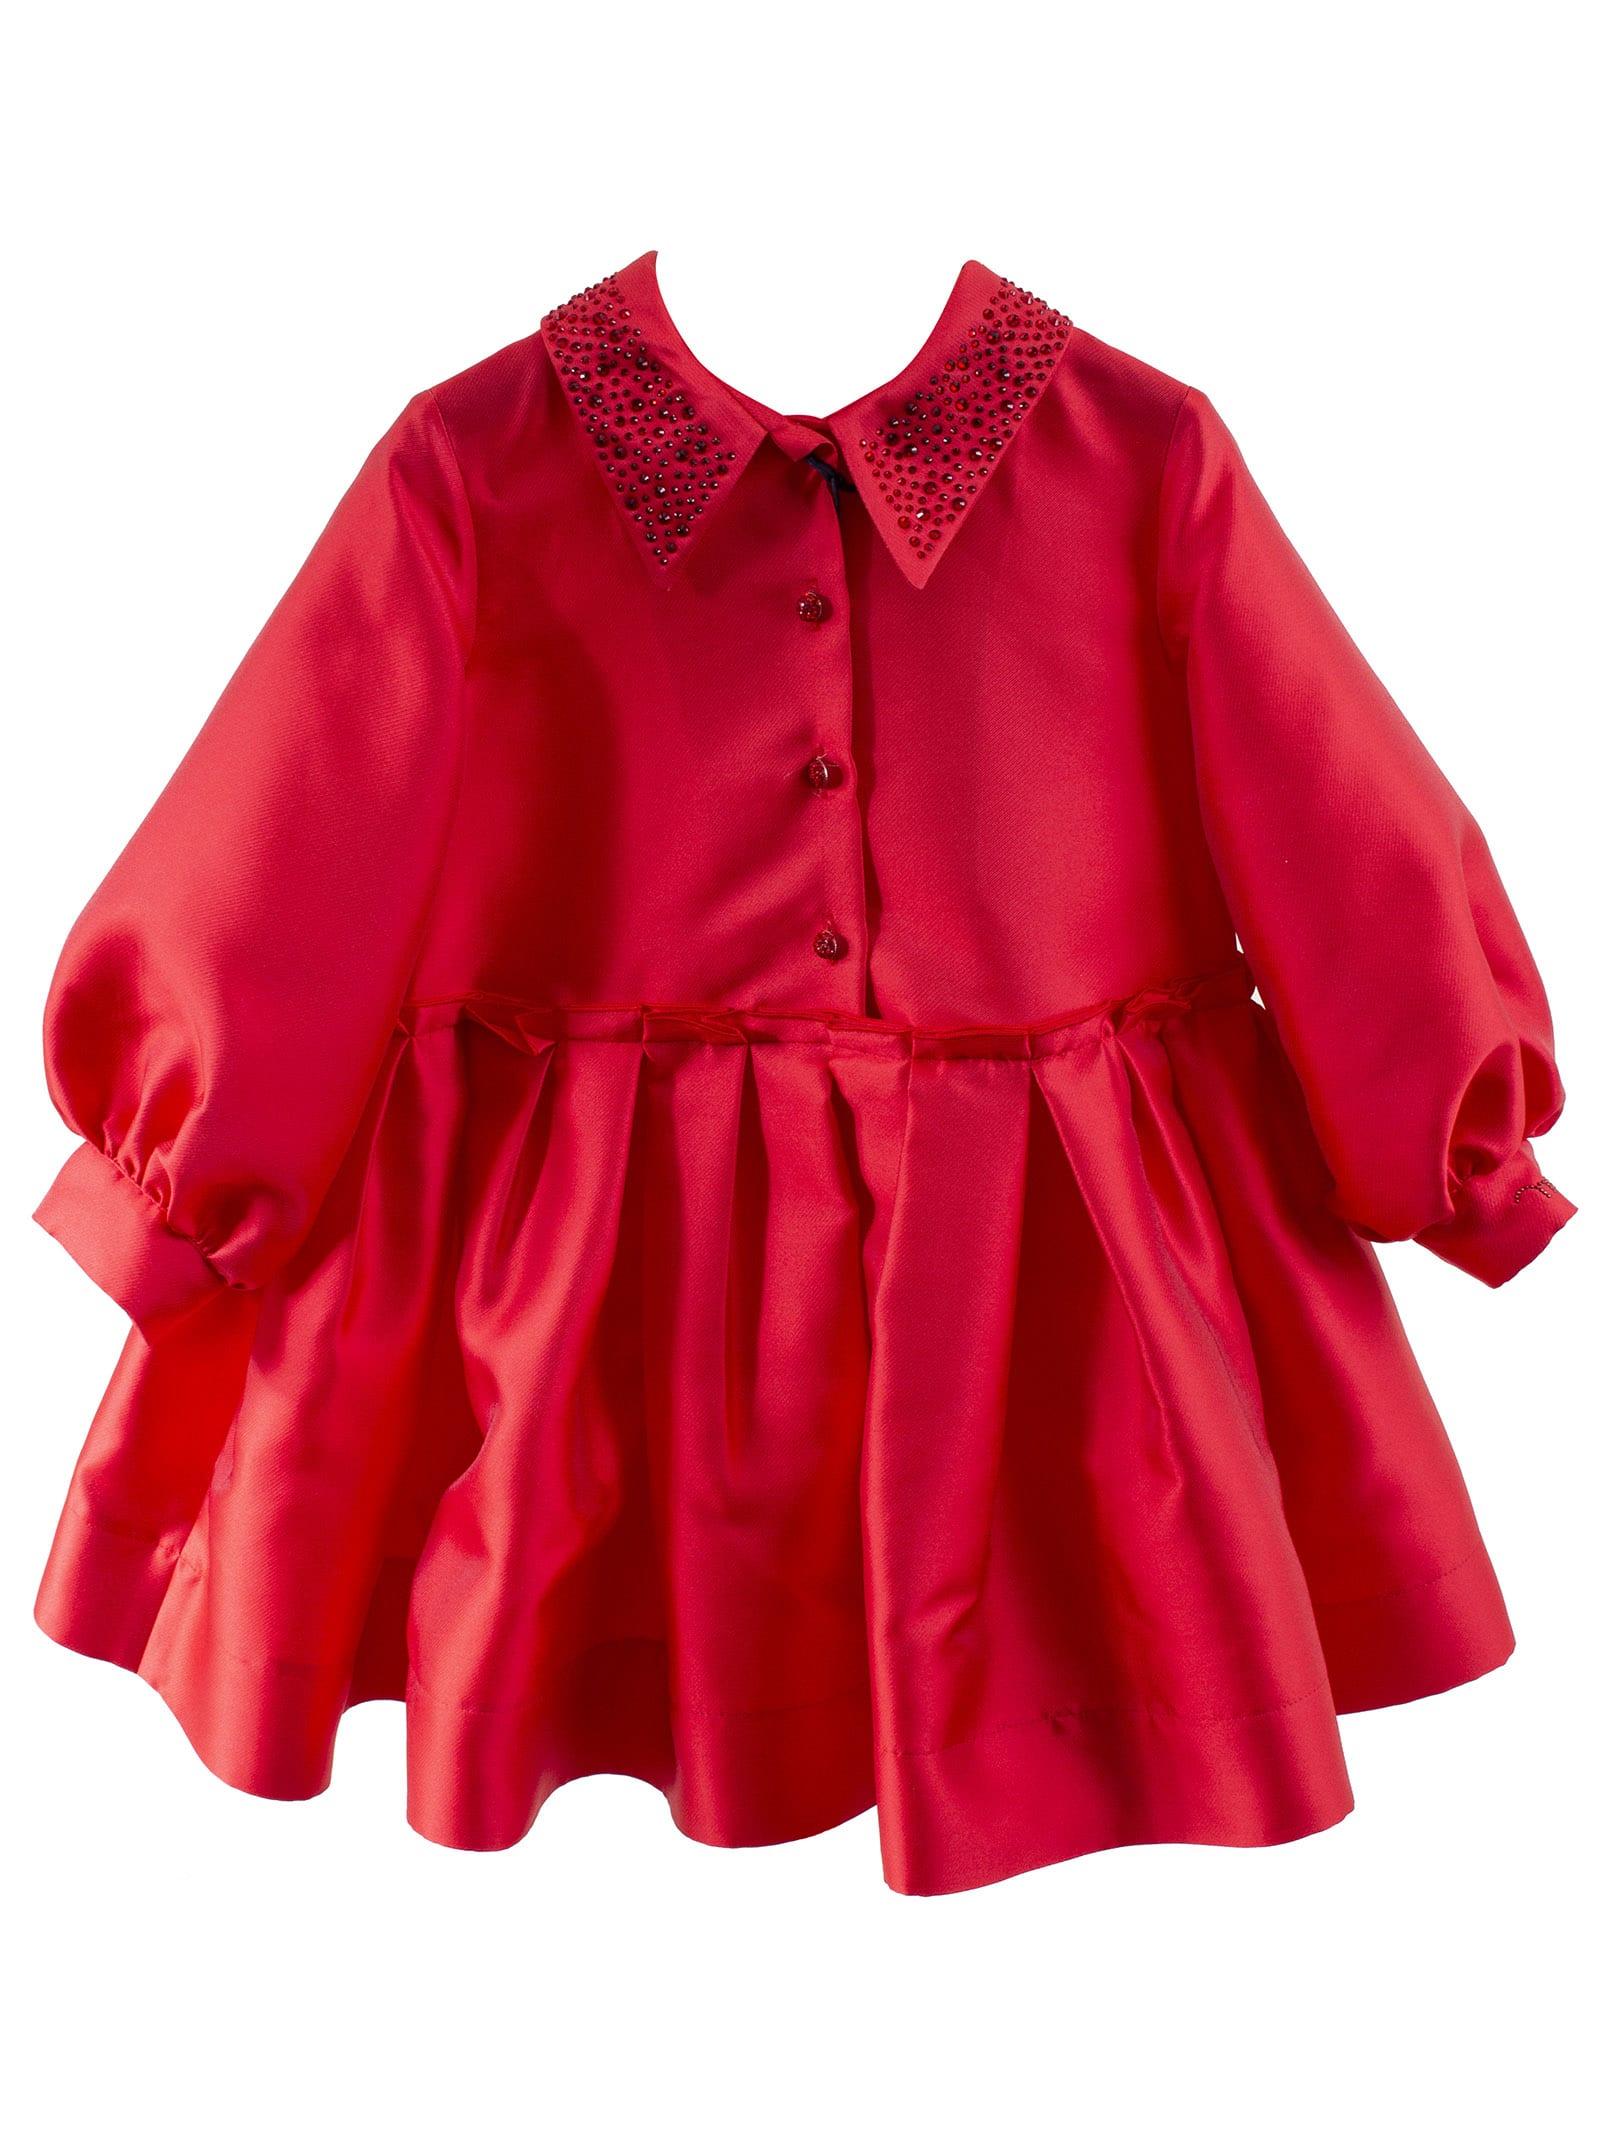 MiMiSol Baby Girl Dress